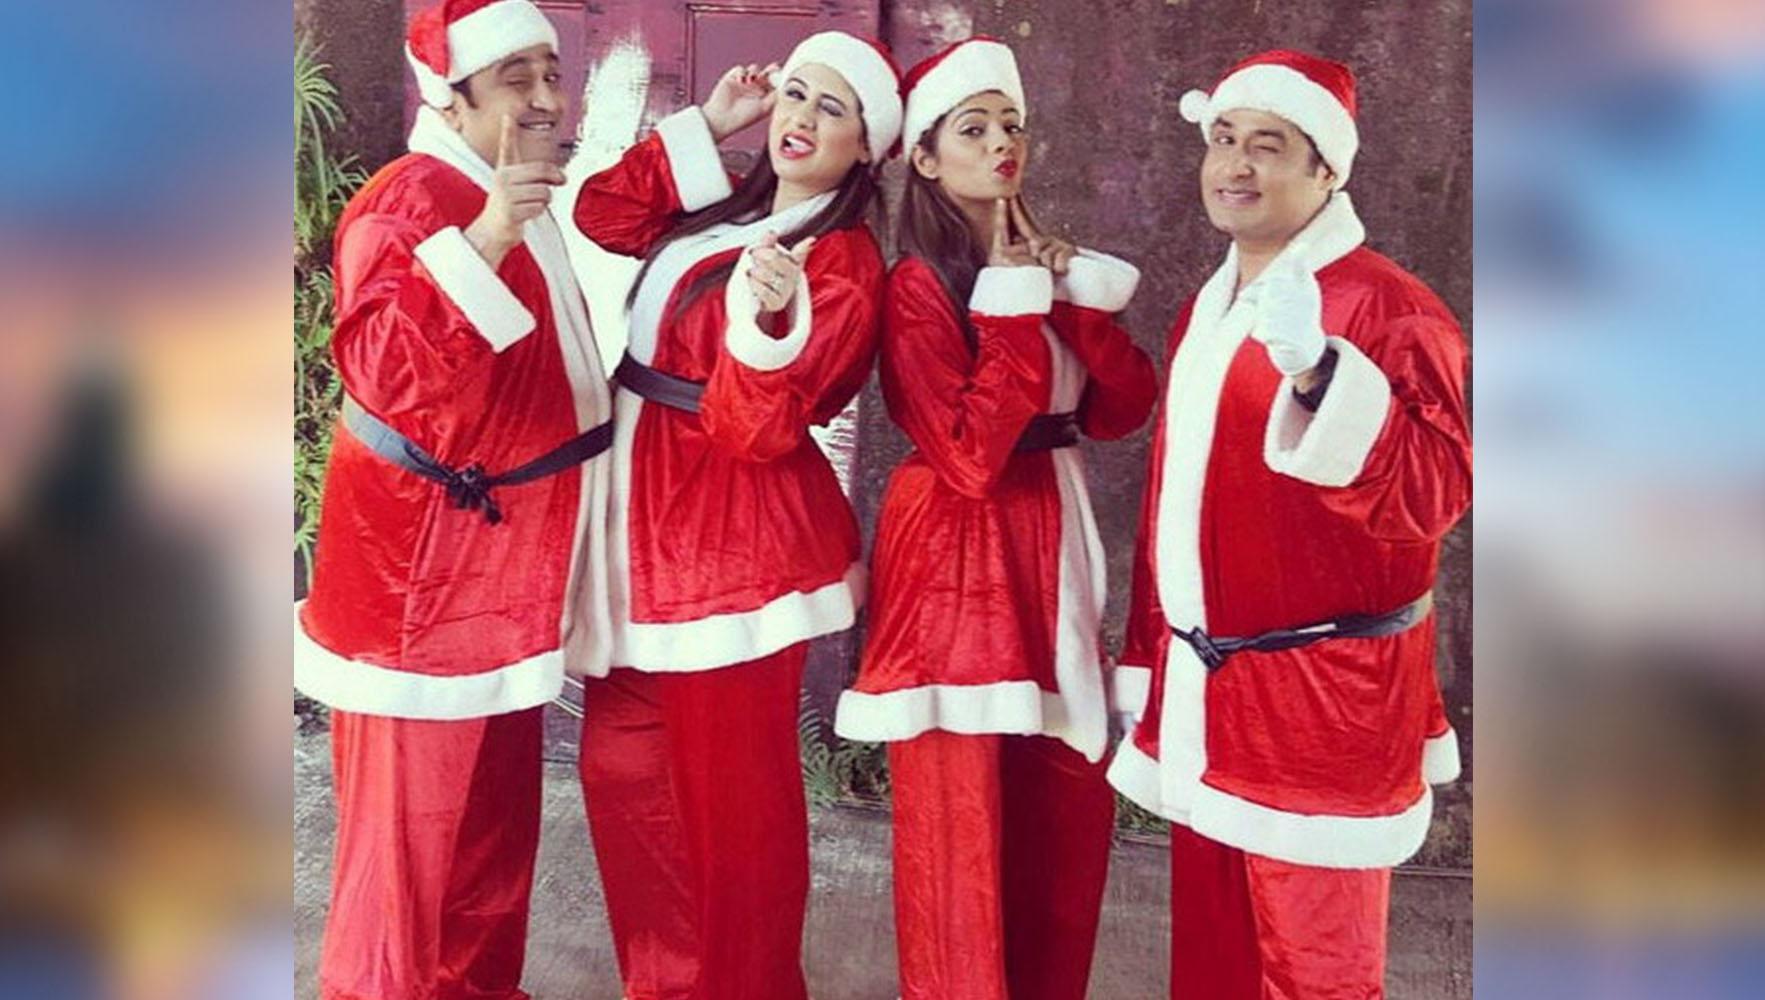 Tv shows celebrities celebrating christmas